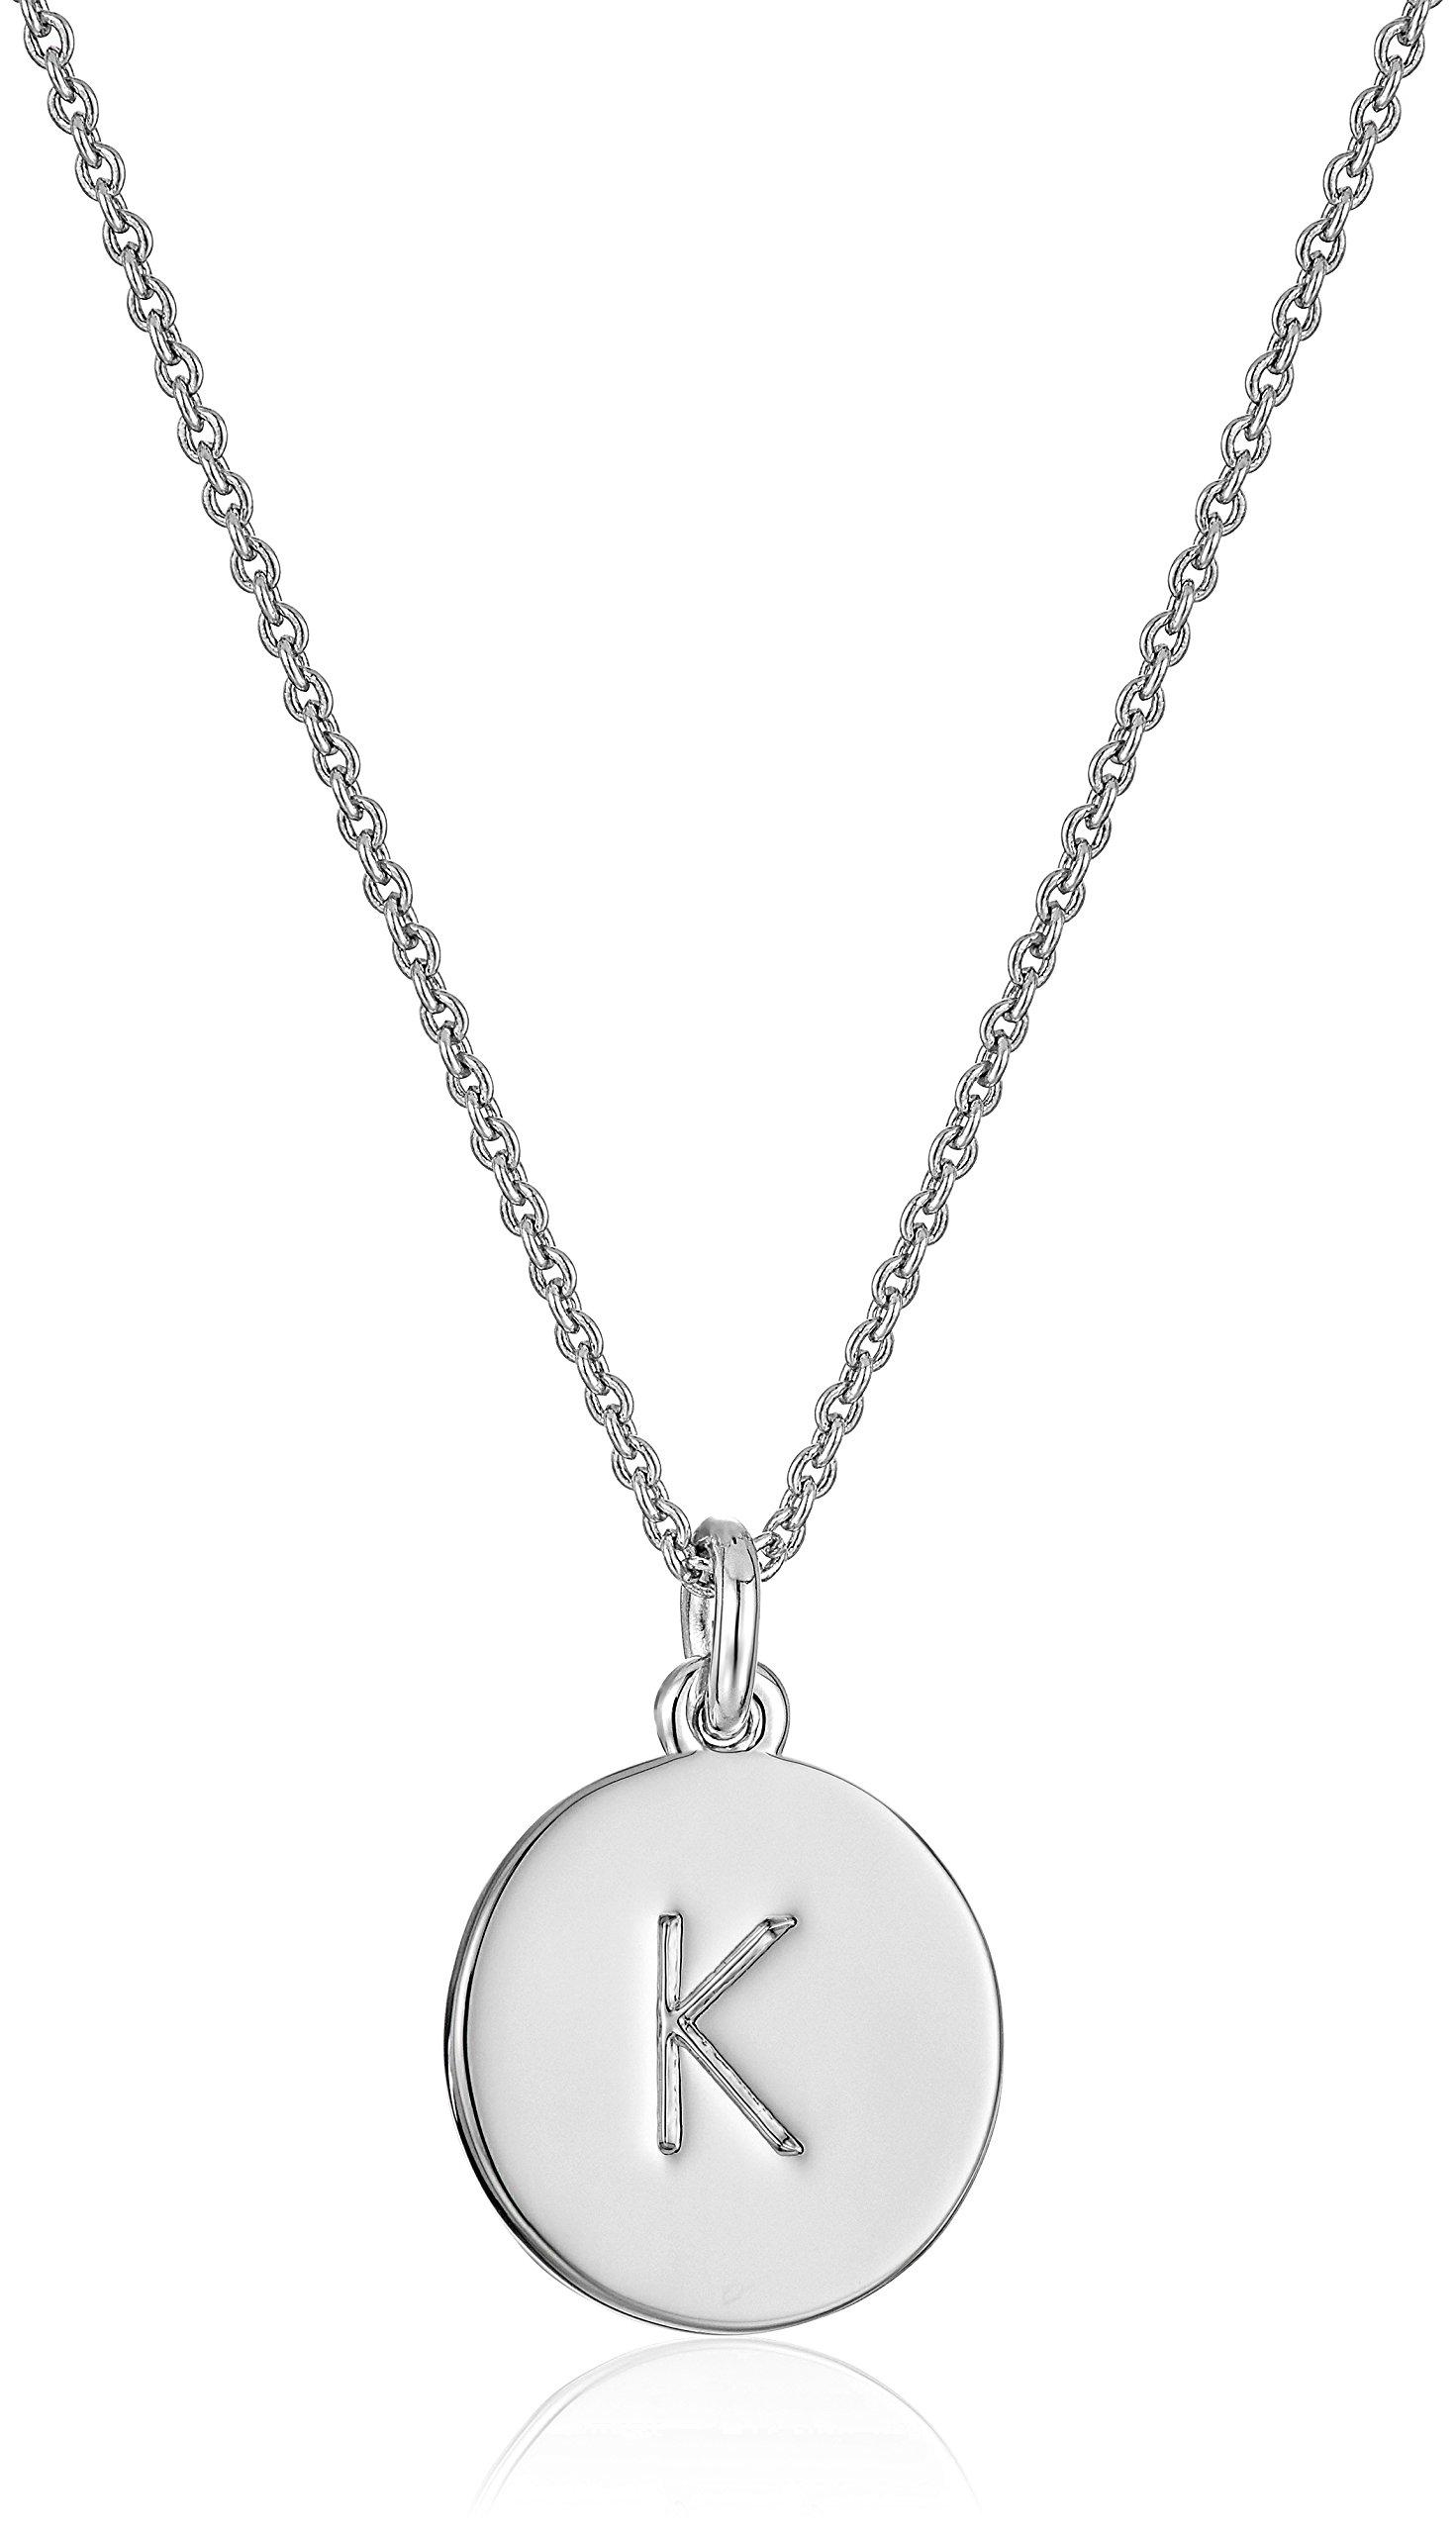 Kate Spade New York  ''K Pendant Necklace, 17'' + 3.5'' Extender